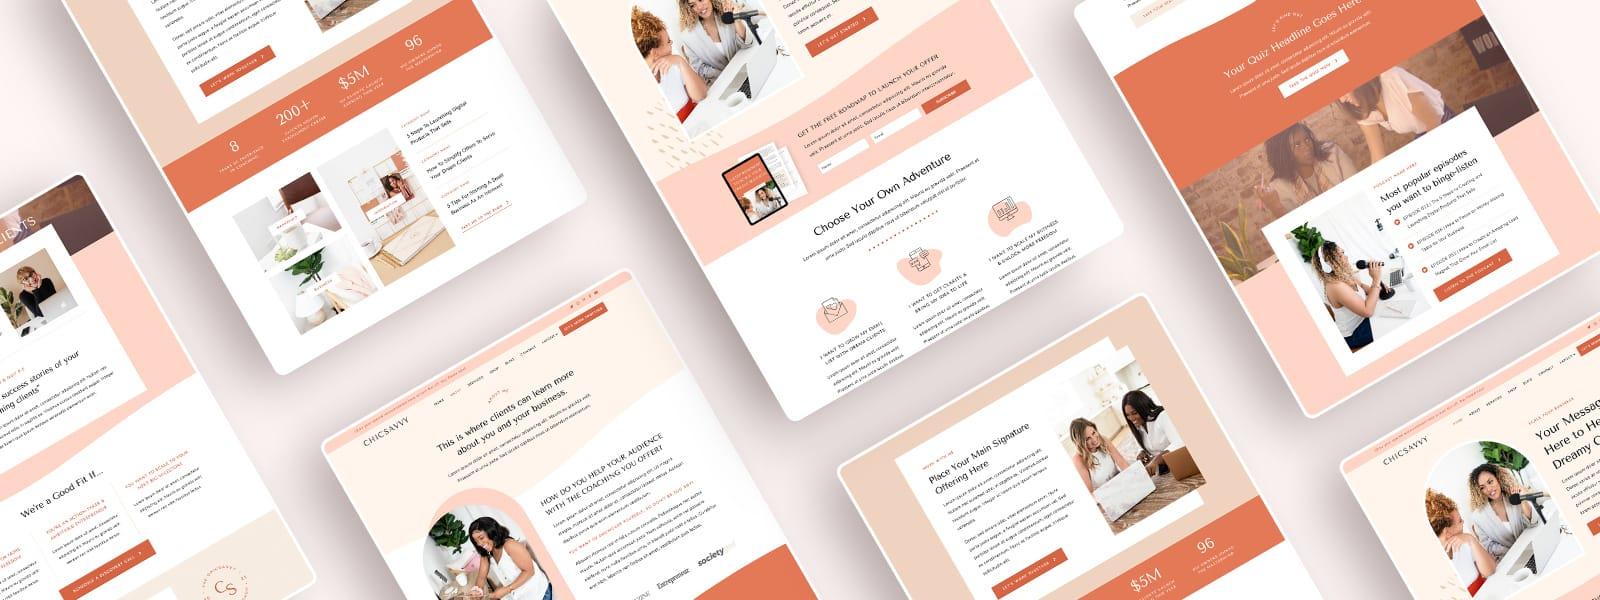 Elementor website templates | ChicSavvy coaching wordpress theme